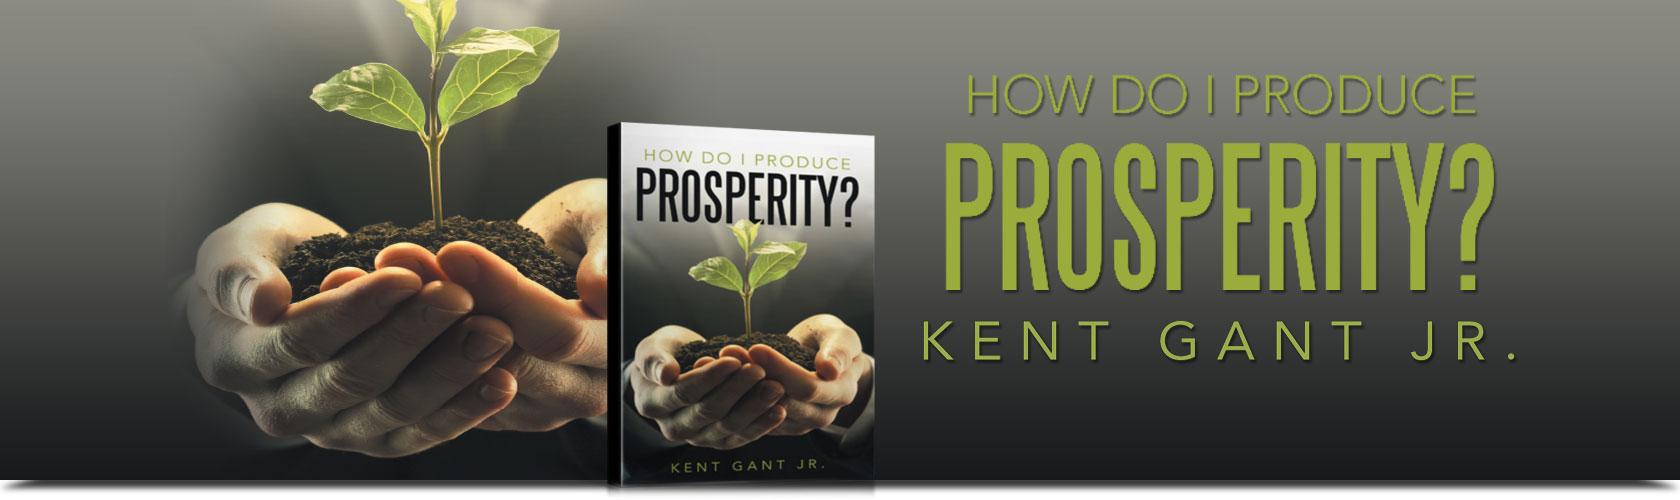 How Do I Produce Prosperity? By Kent Gant Jr